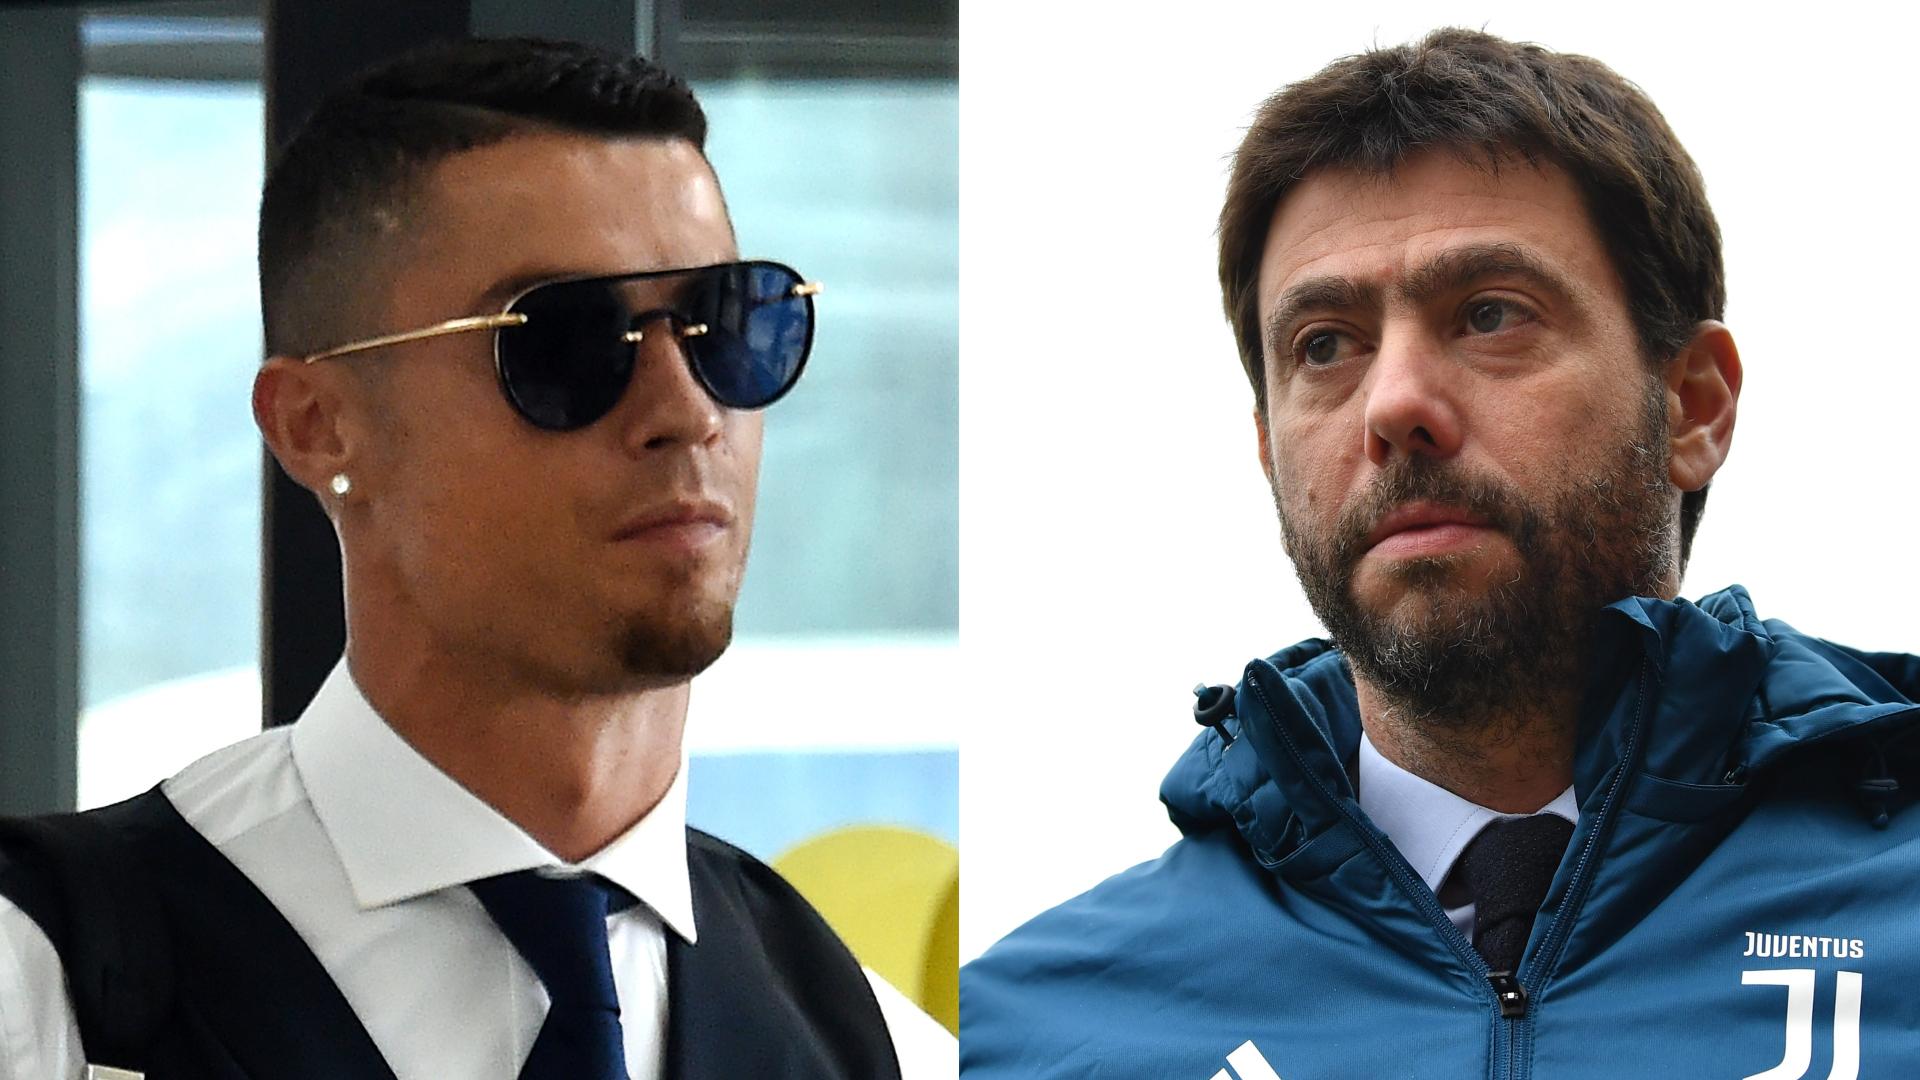 Calciomercato Juventus, Ronaldo bianconero? Agnelli vola a Kalamata